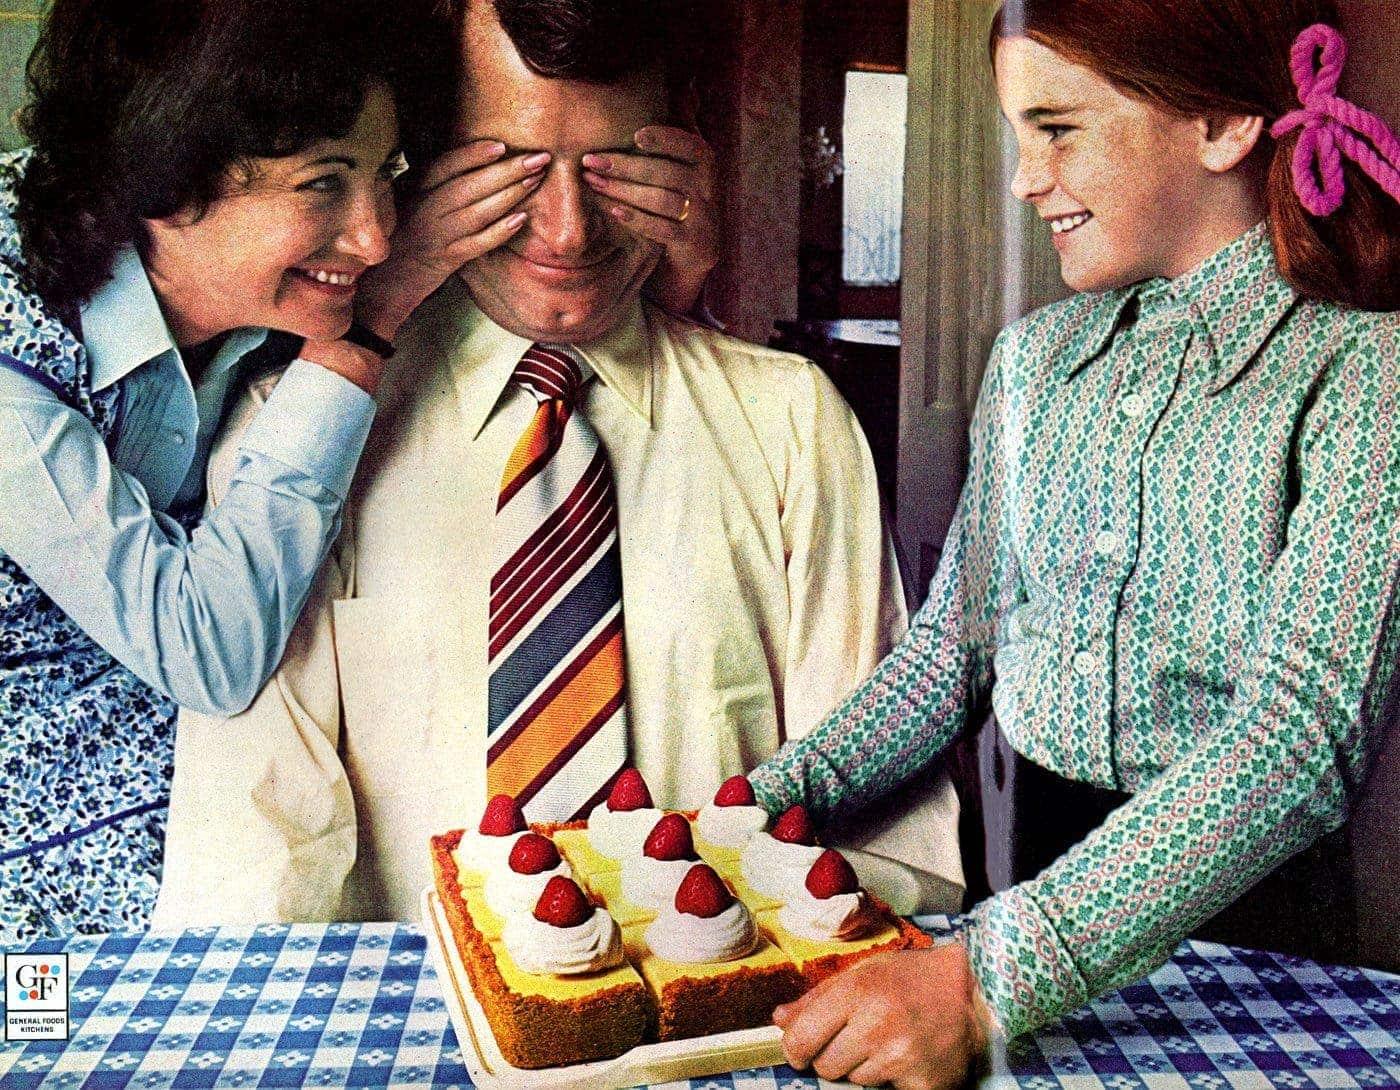 Jell-O no-bake pudding cheesecake retro recipe (1972)